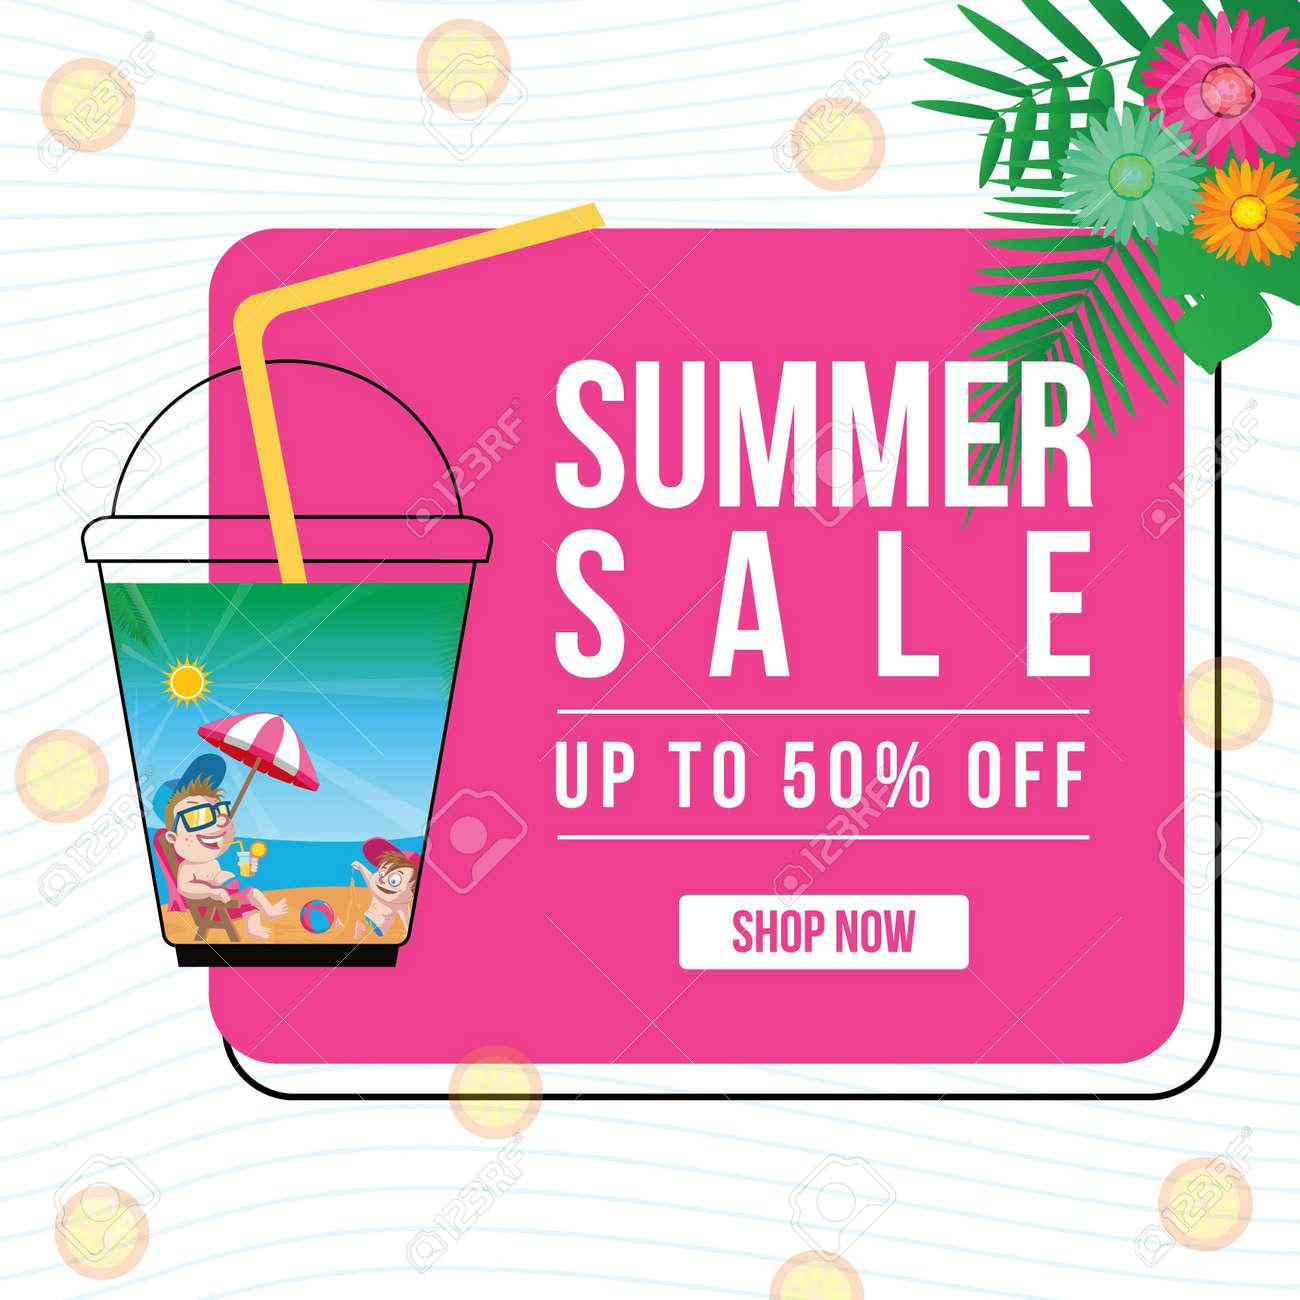 Summer sale banner design template. Vector graphic illustration. - 171677499